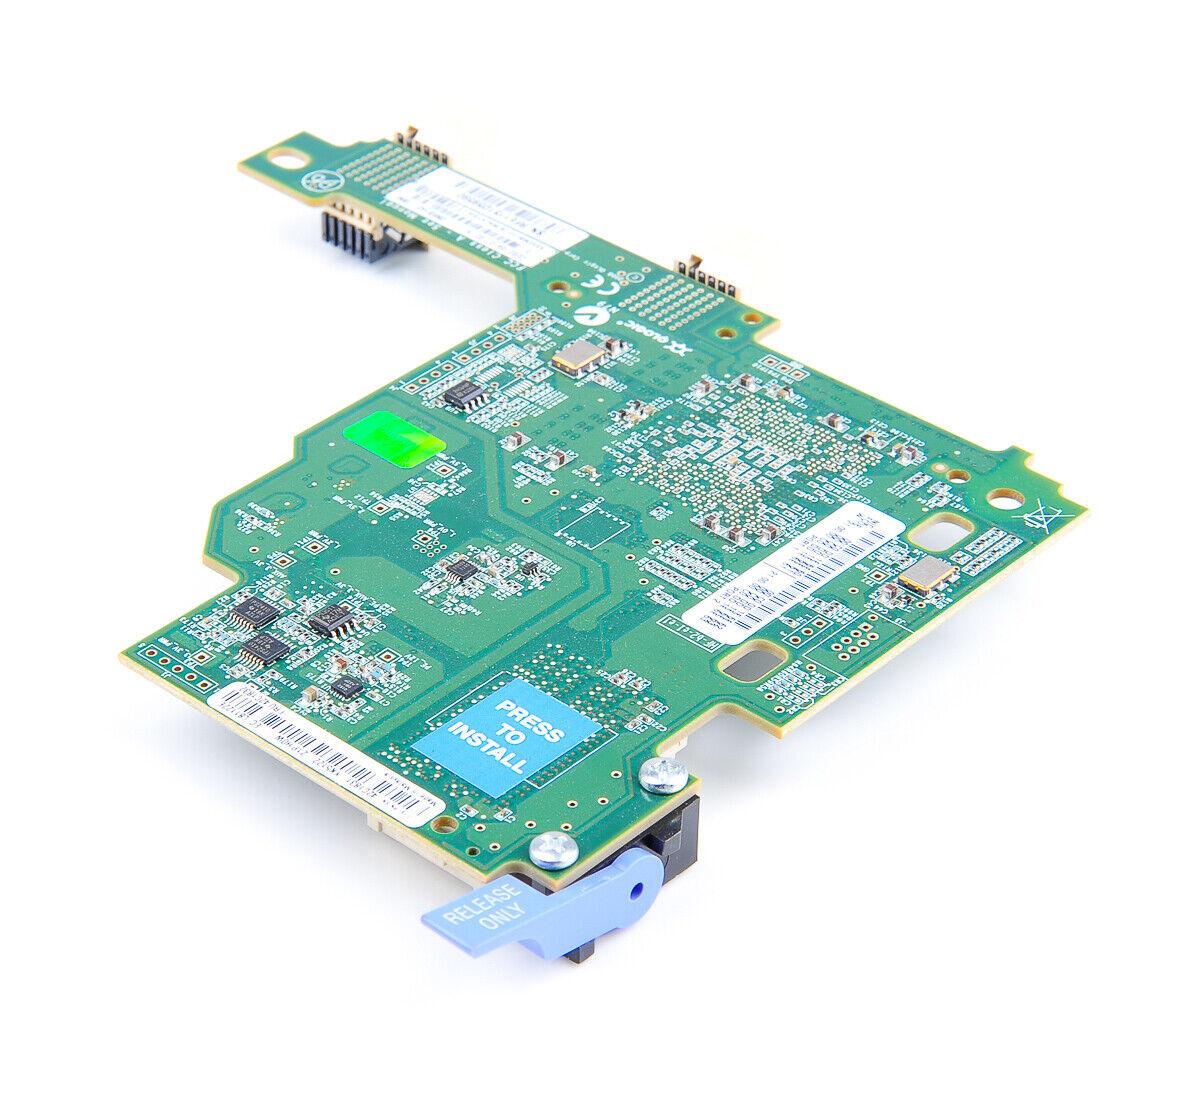 IBM 2 port 10 Gbit/s converged network Adapter (CFFh)